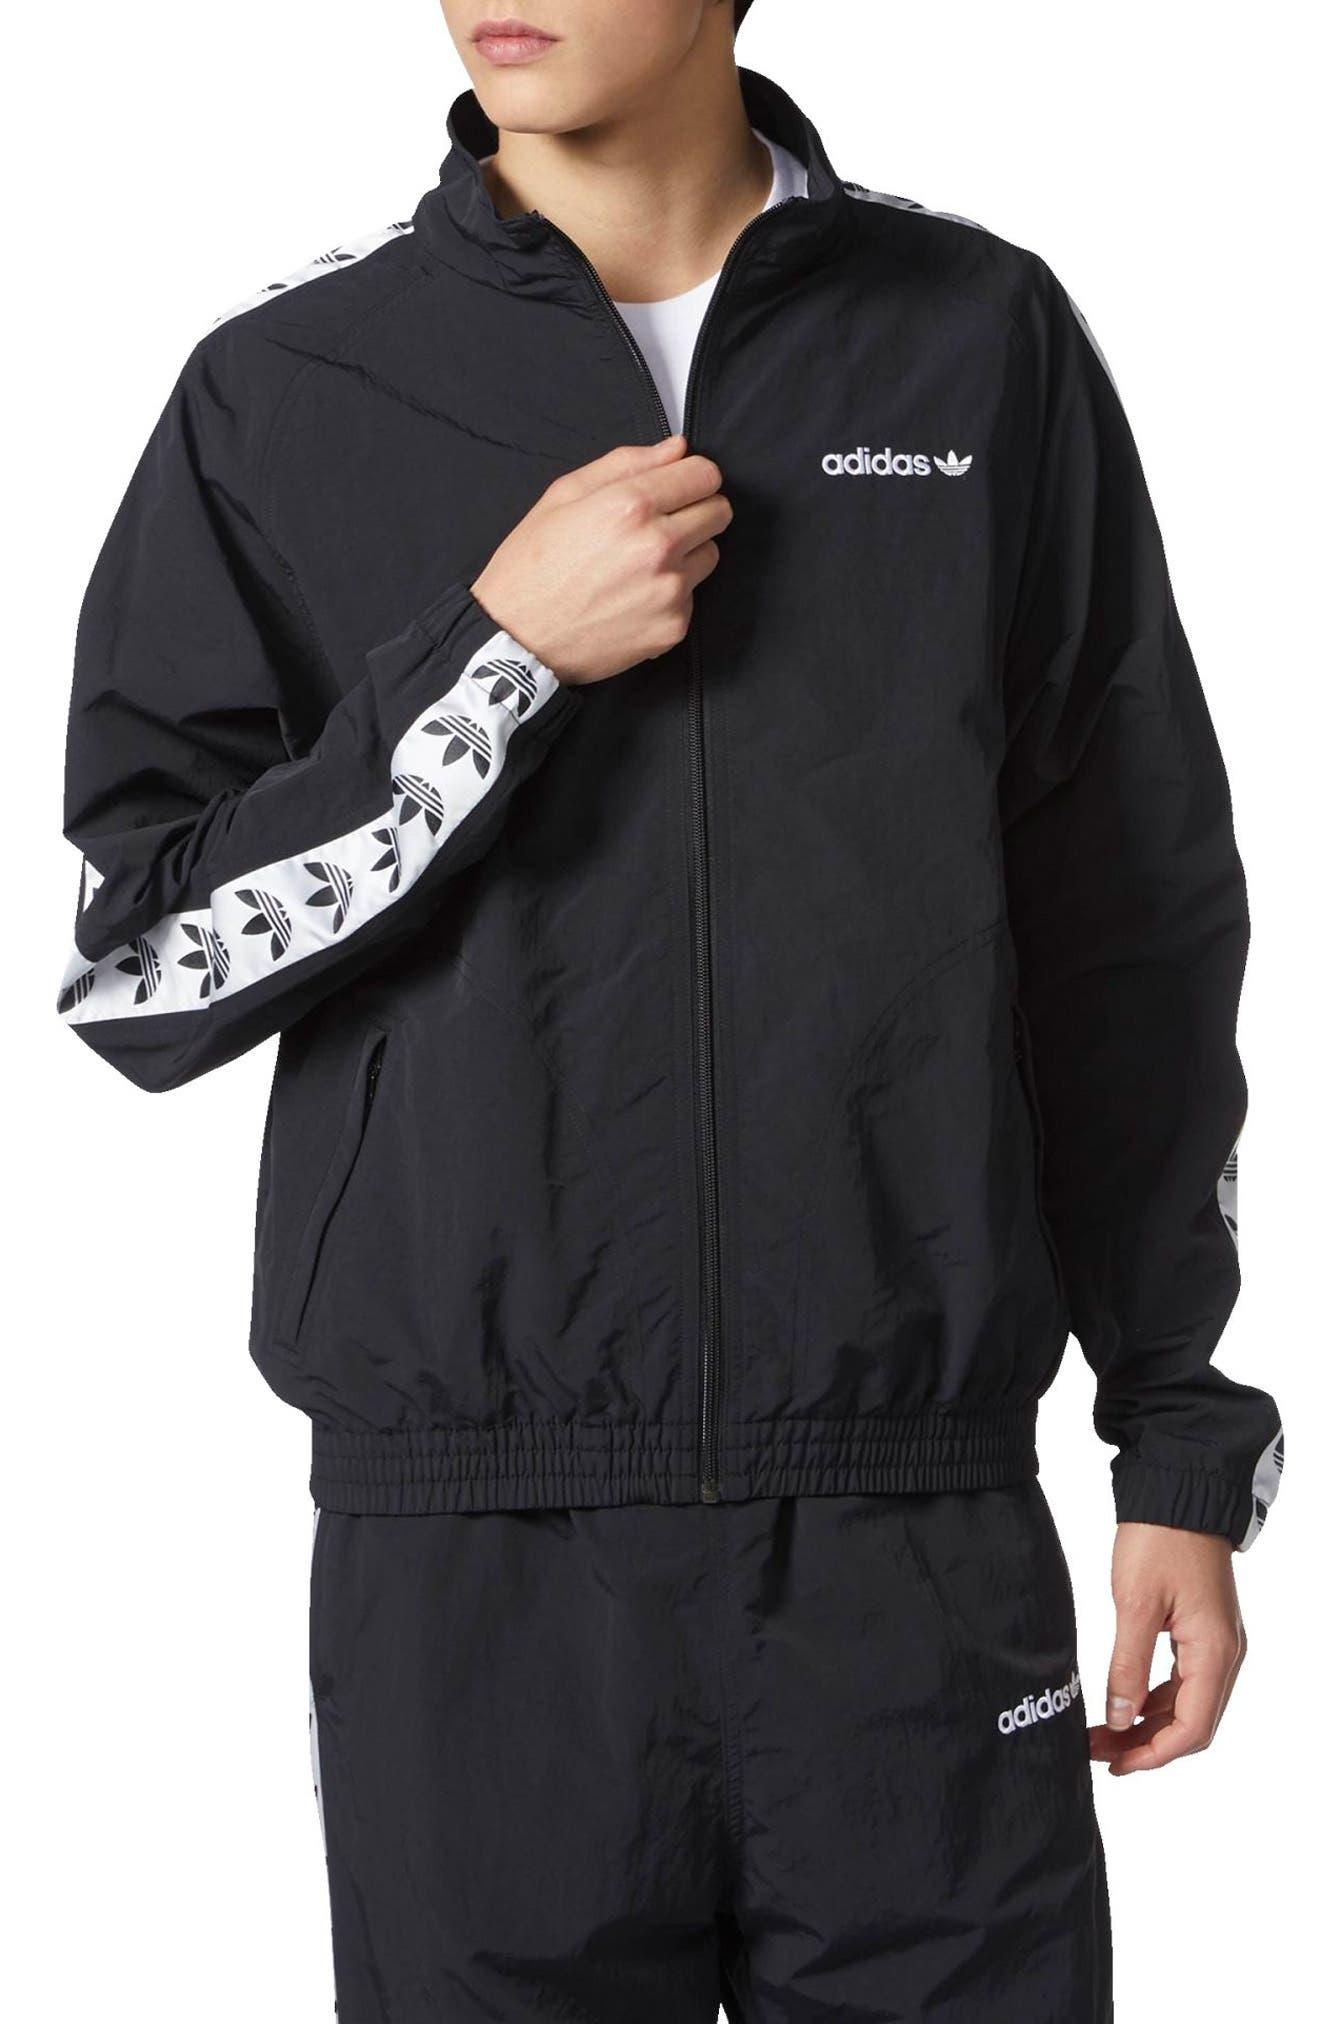 Main Image - adidas Originals TNT Tape Wind Jacket